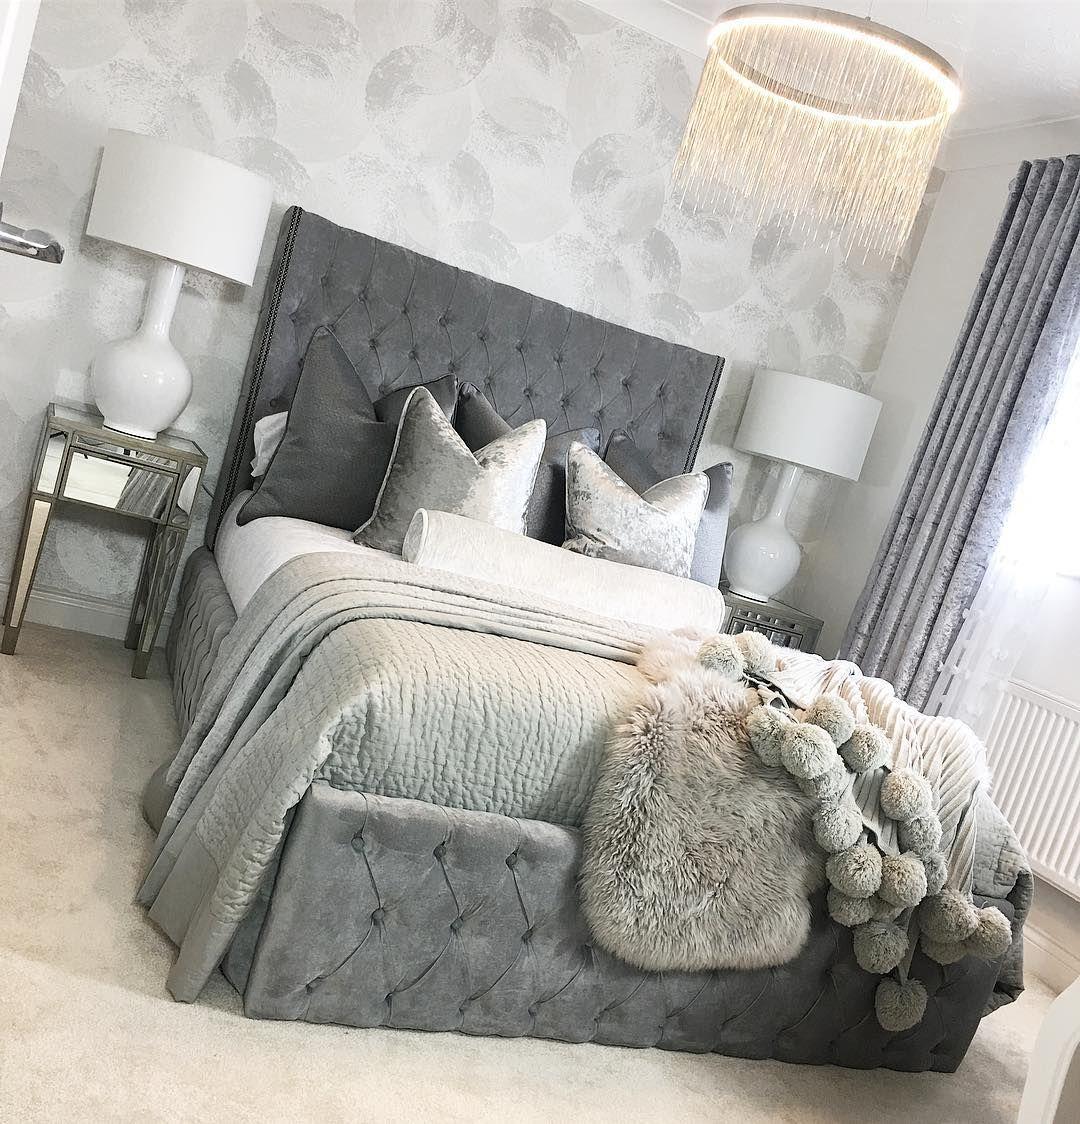 Astounding Instagram Door No 7 Safina Wing Back King Size Ottoman Bed Spiritservingveterans Wood Chair Design Ideas Spiritservingveteransorg